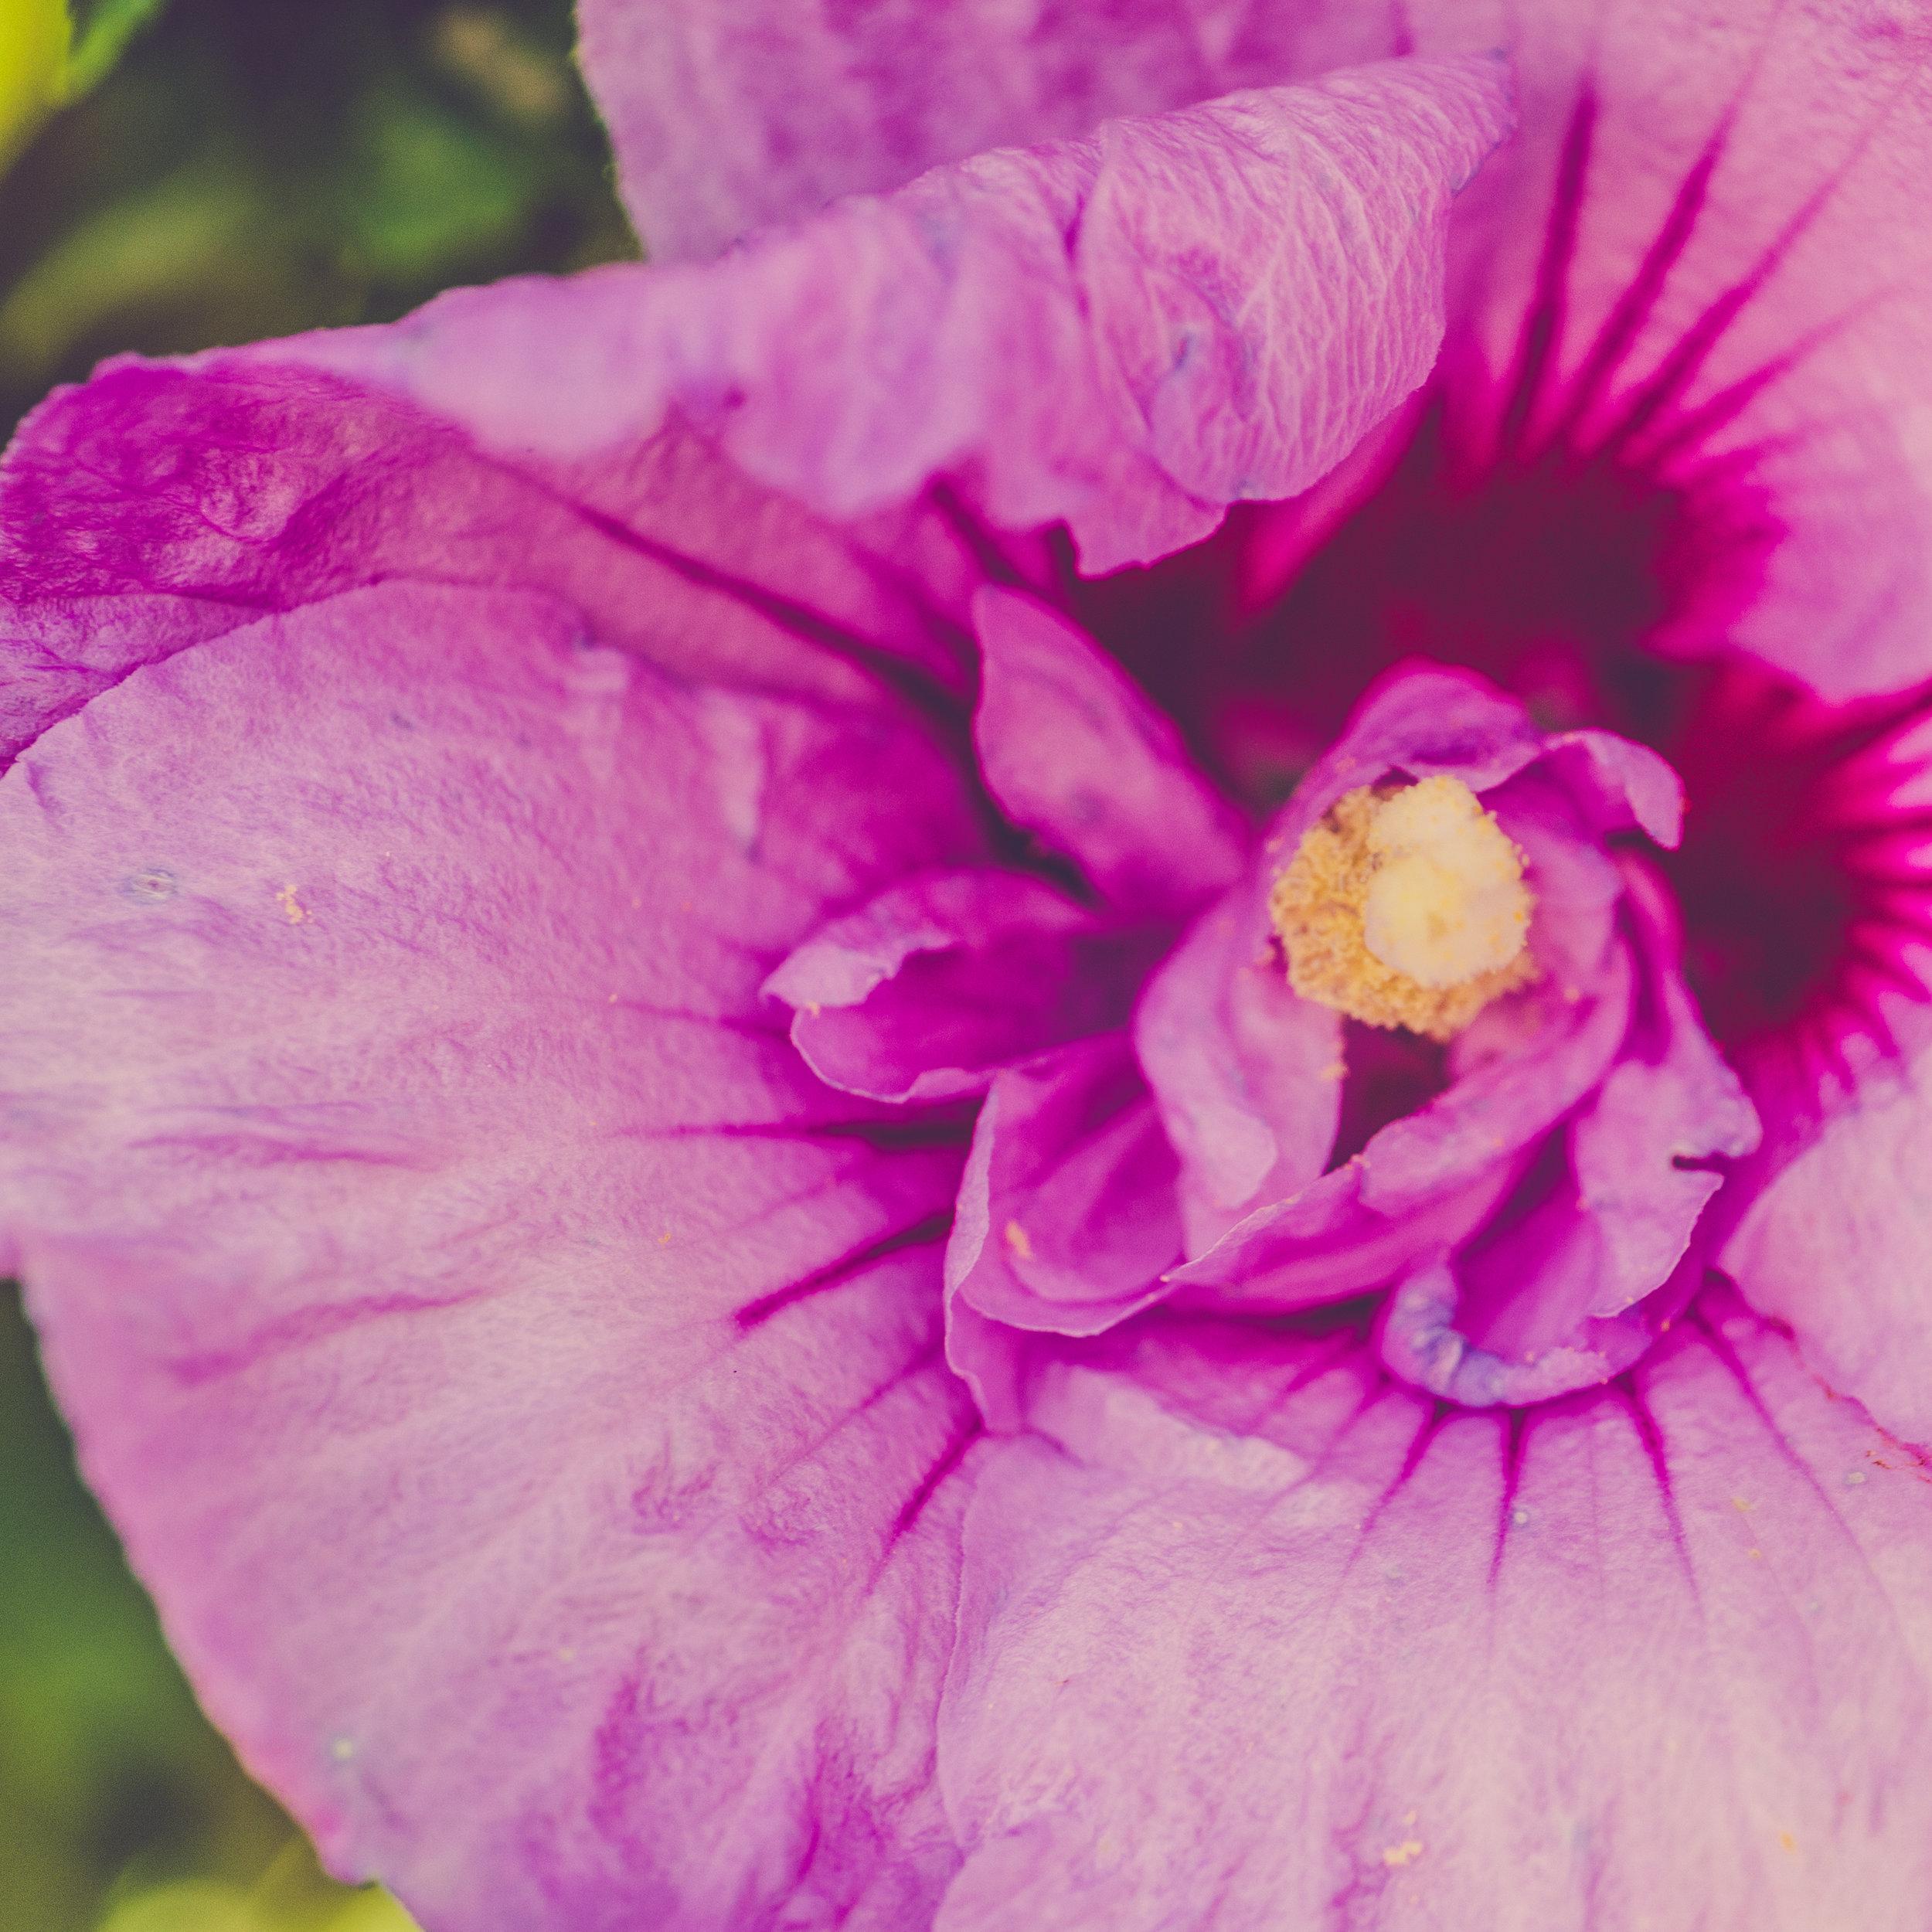 ThePaintedSquare_ErnstTrail_Flowers-4.jpg